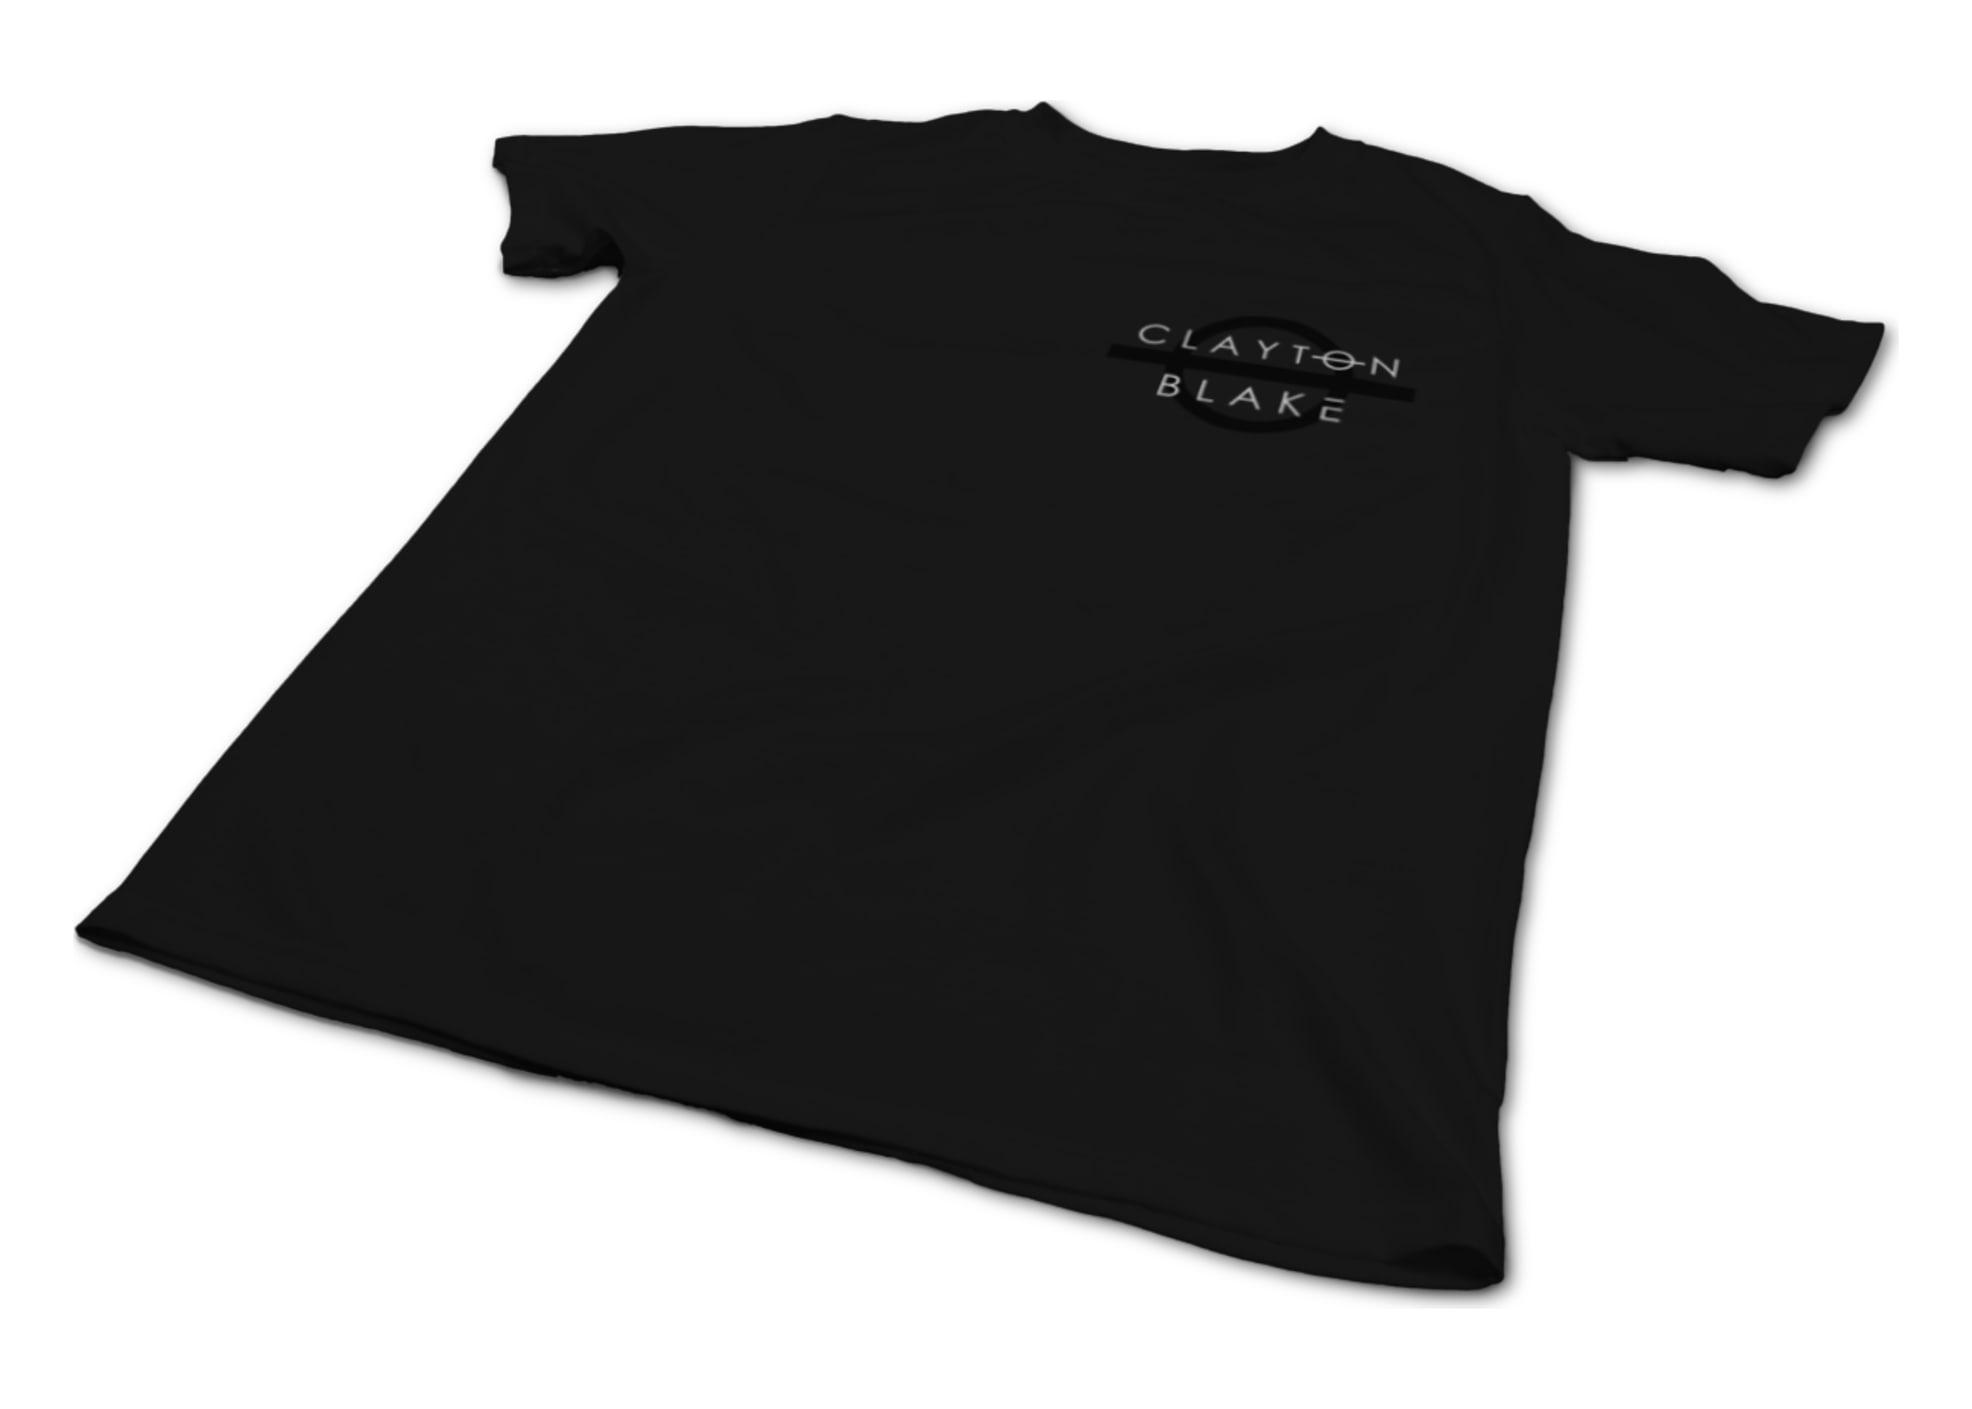 Clayton blake clayton blake i am defiant logo 1610030257